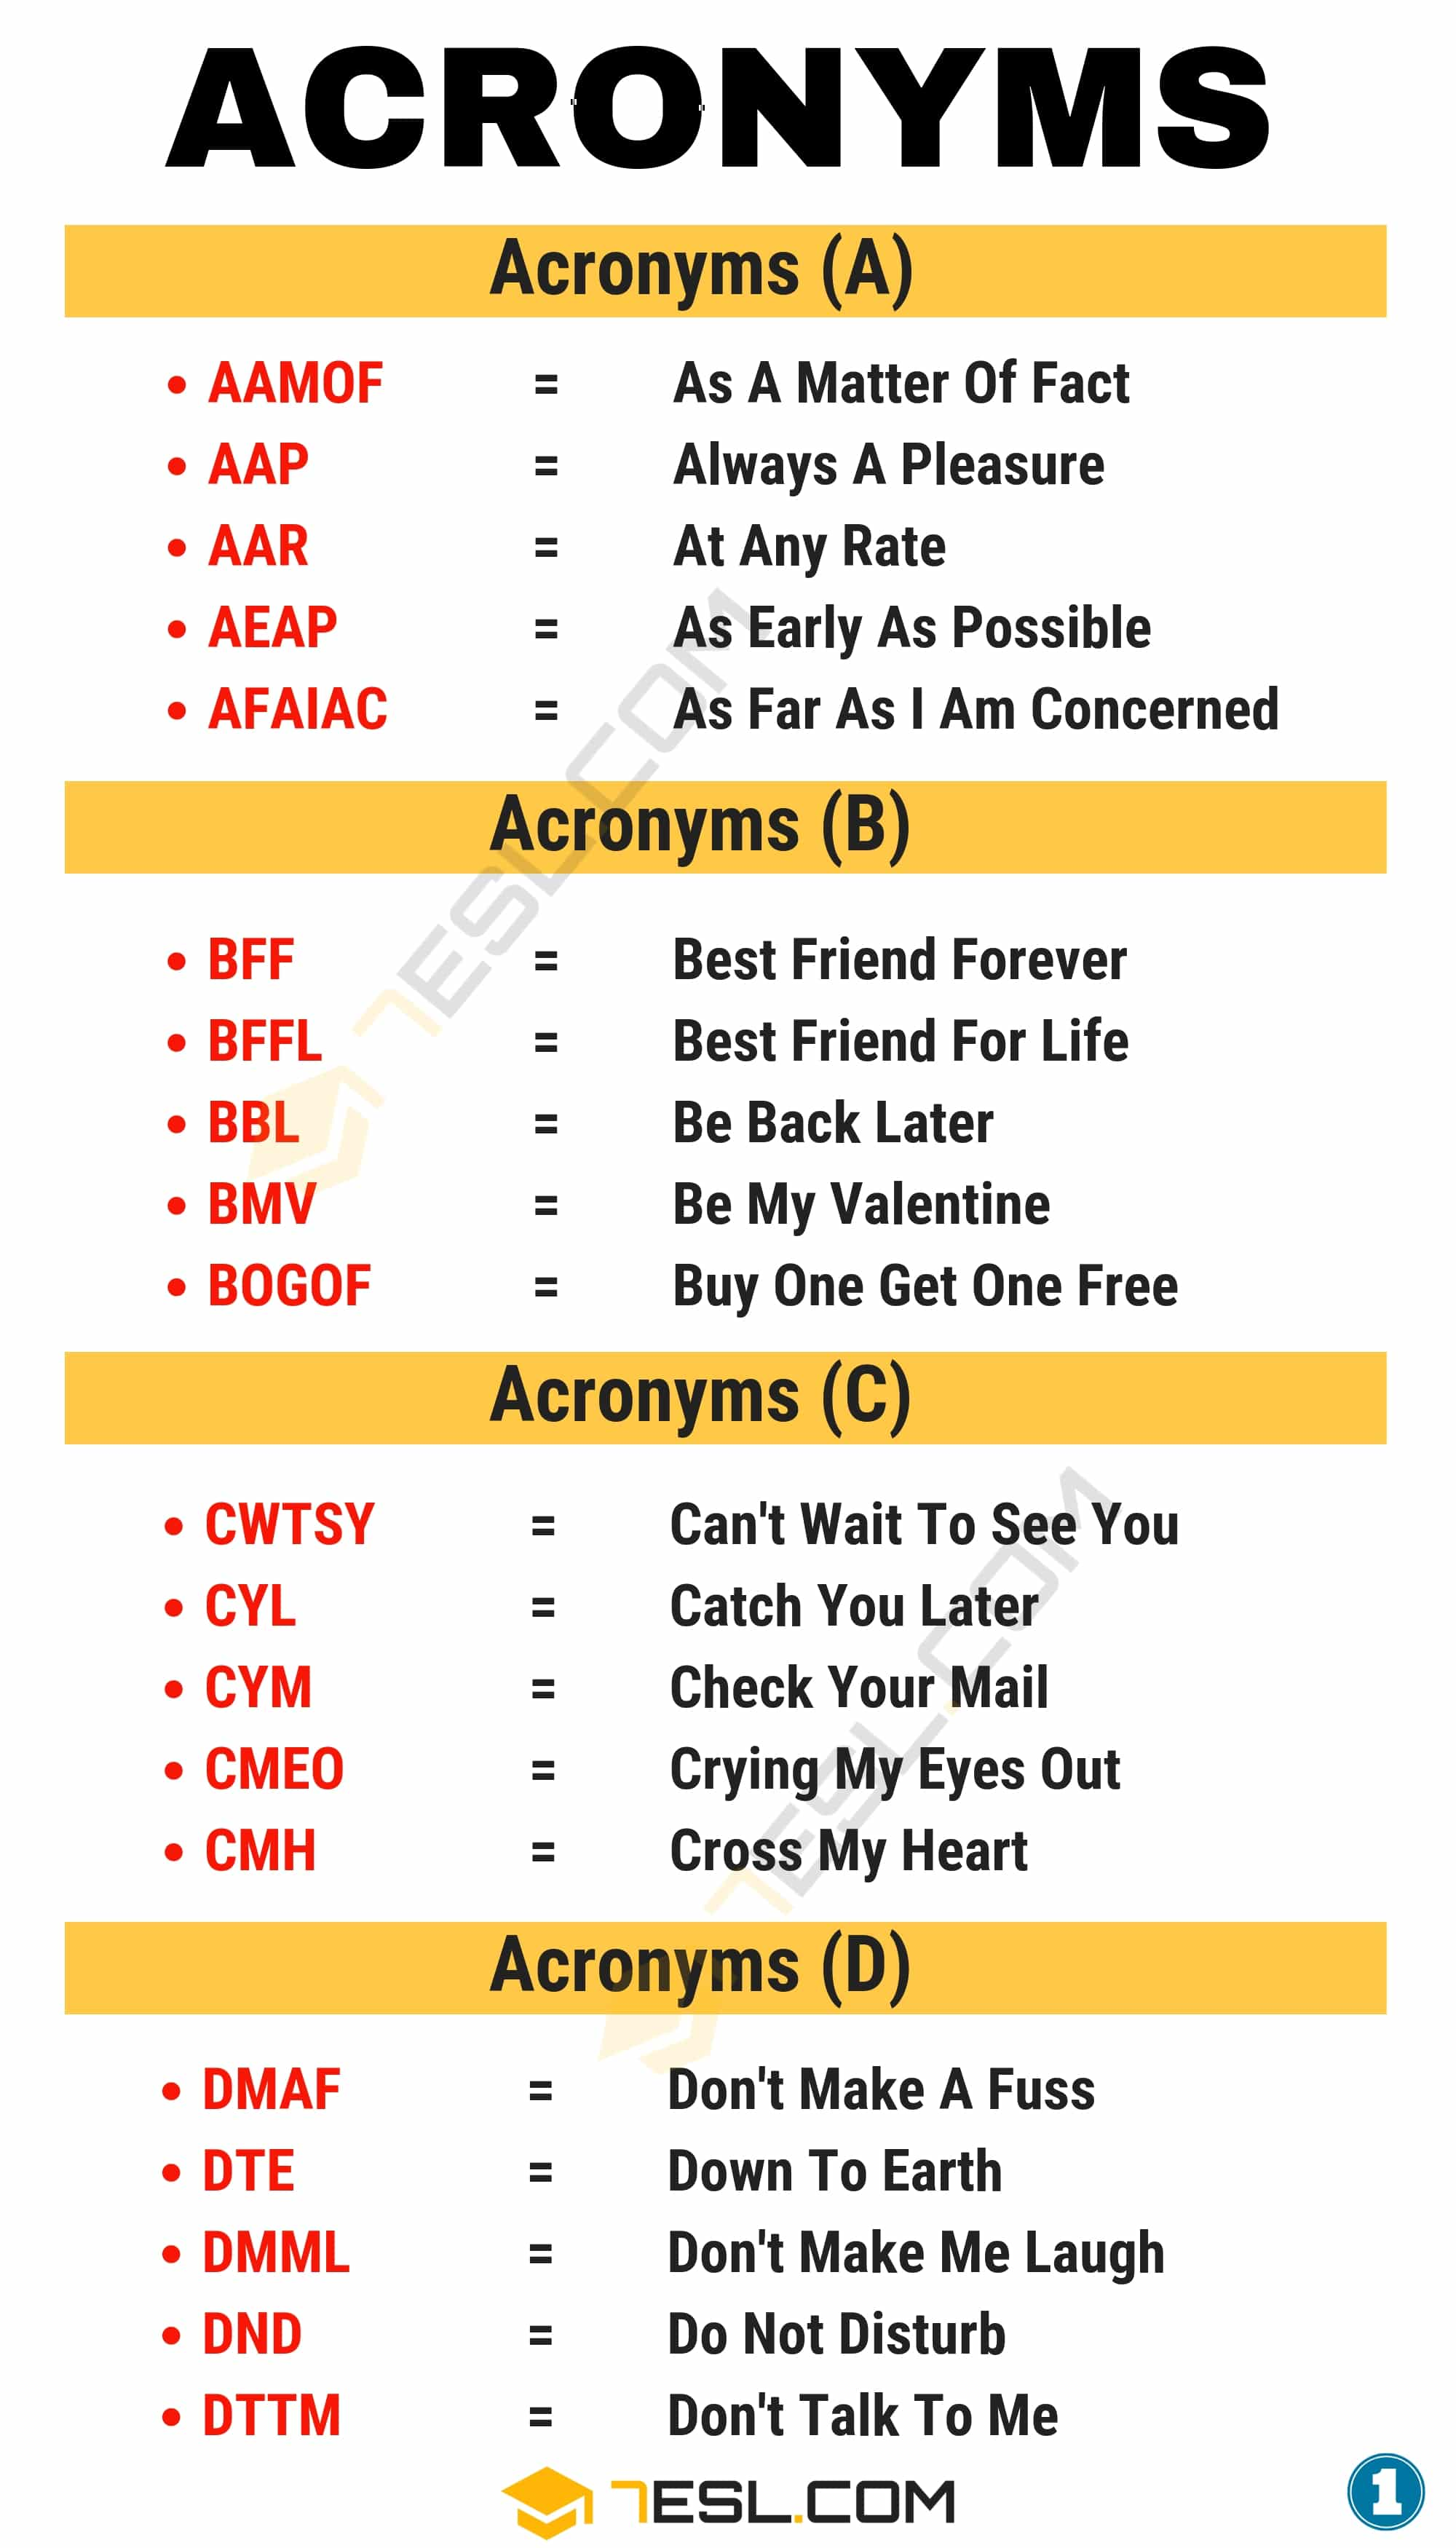 Acronym Definition & Big List of 3000+ Acronyms from A-Z - 7